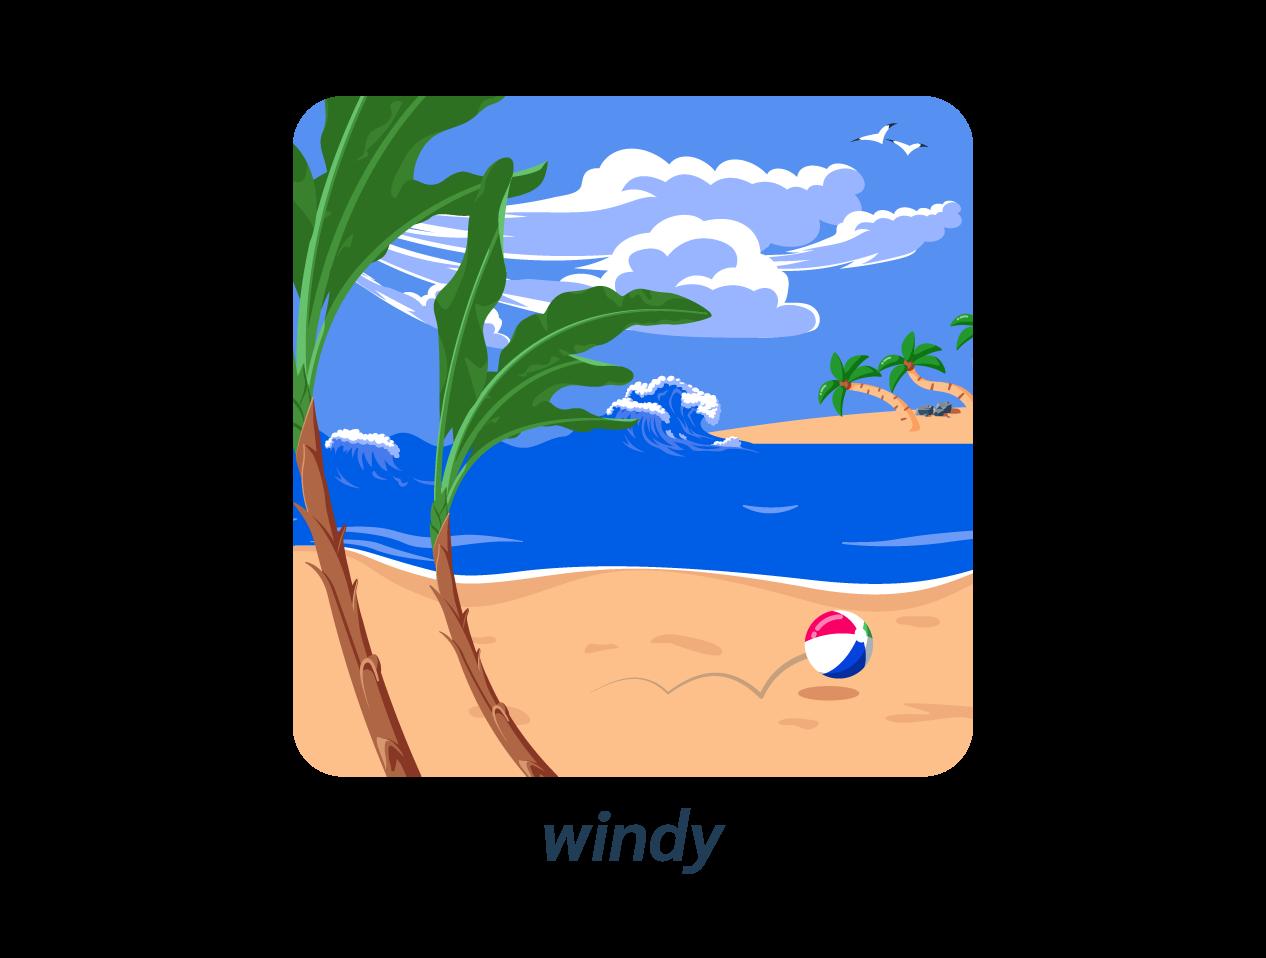 windy vent anglais météo weather